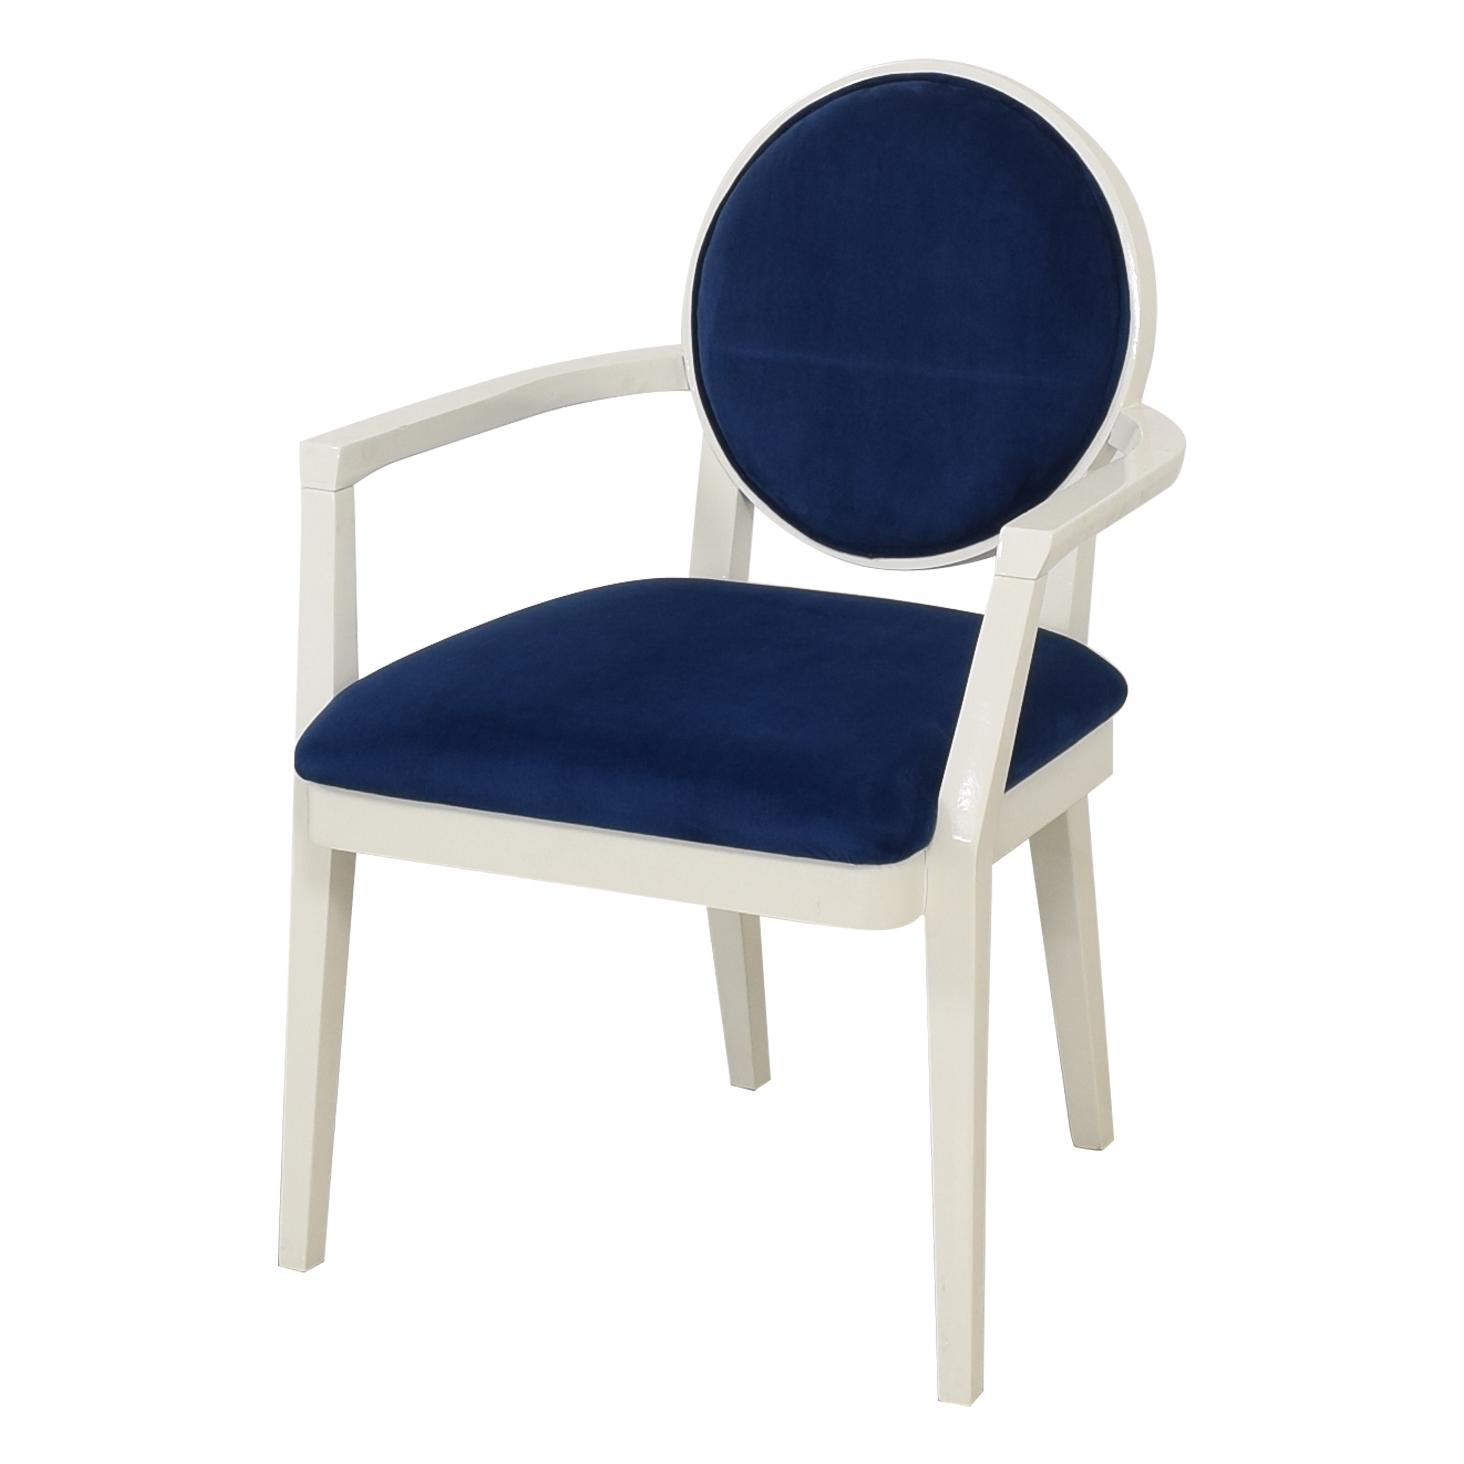 Jonathan Adler Jonathan Adler Happy Chic Dining Chairs second hand